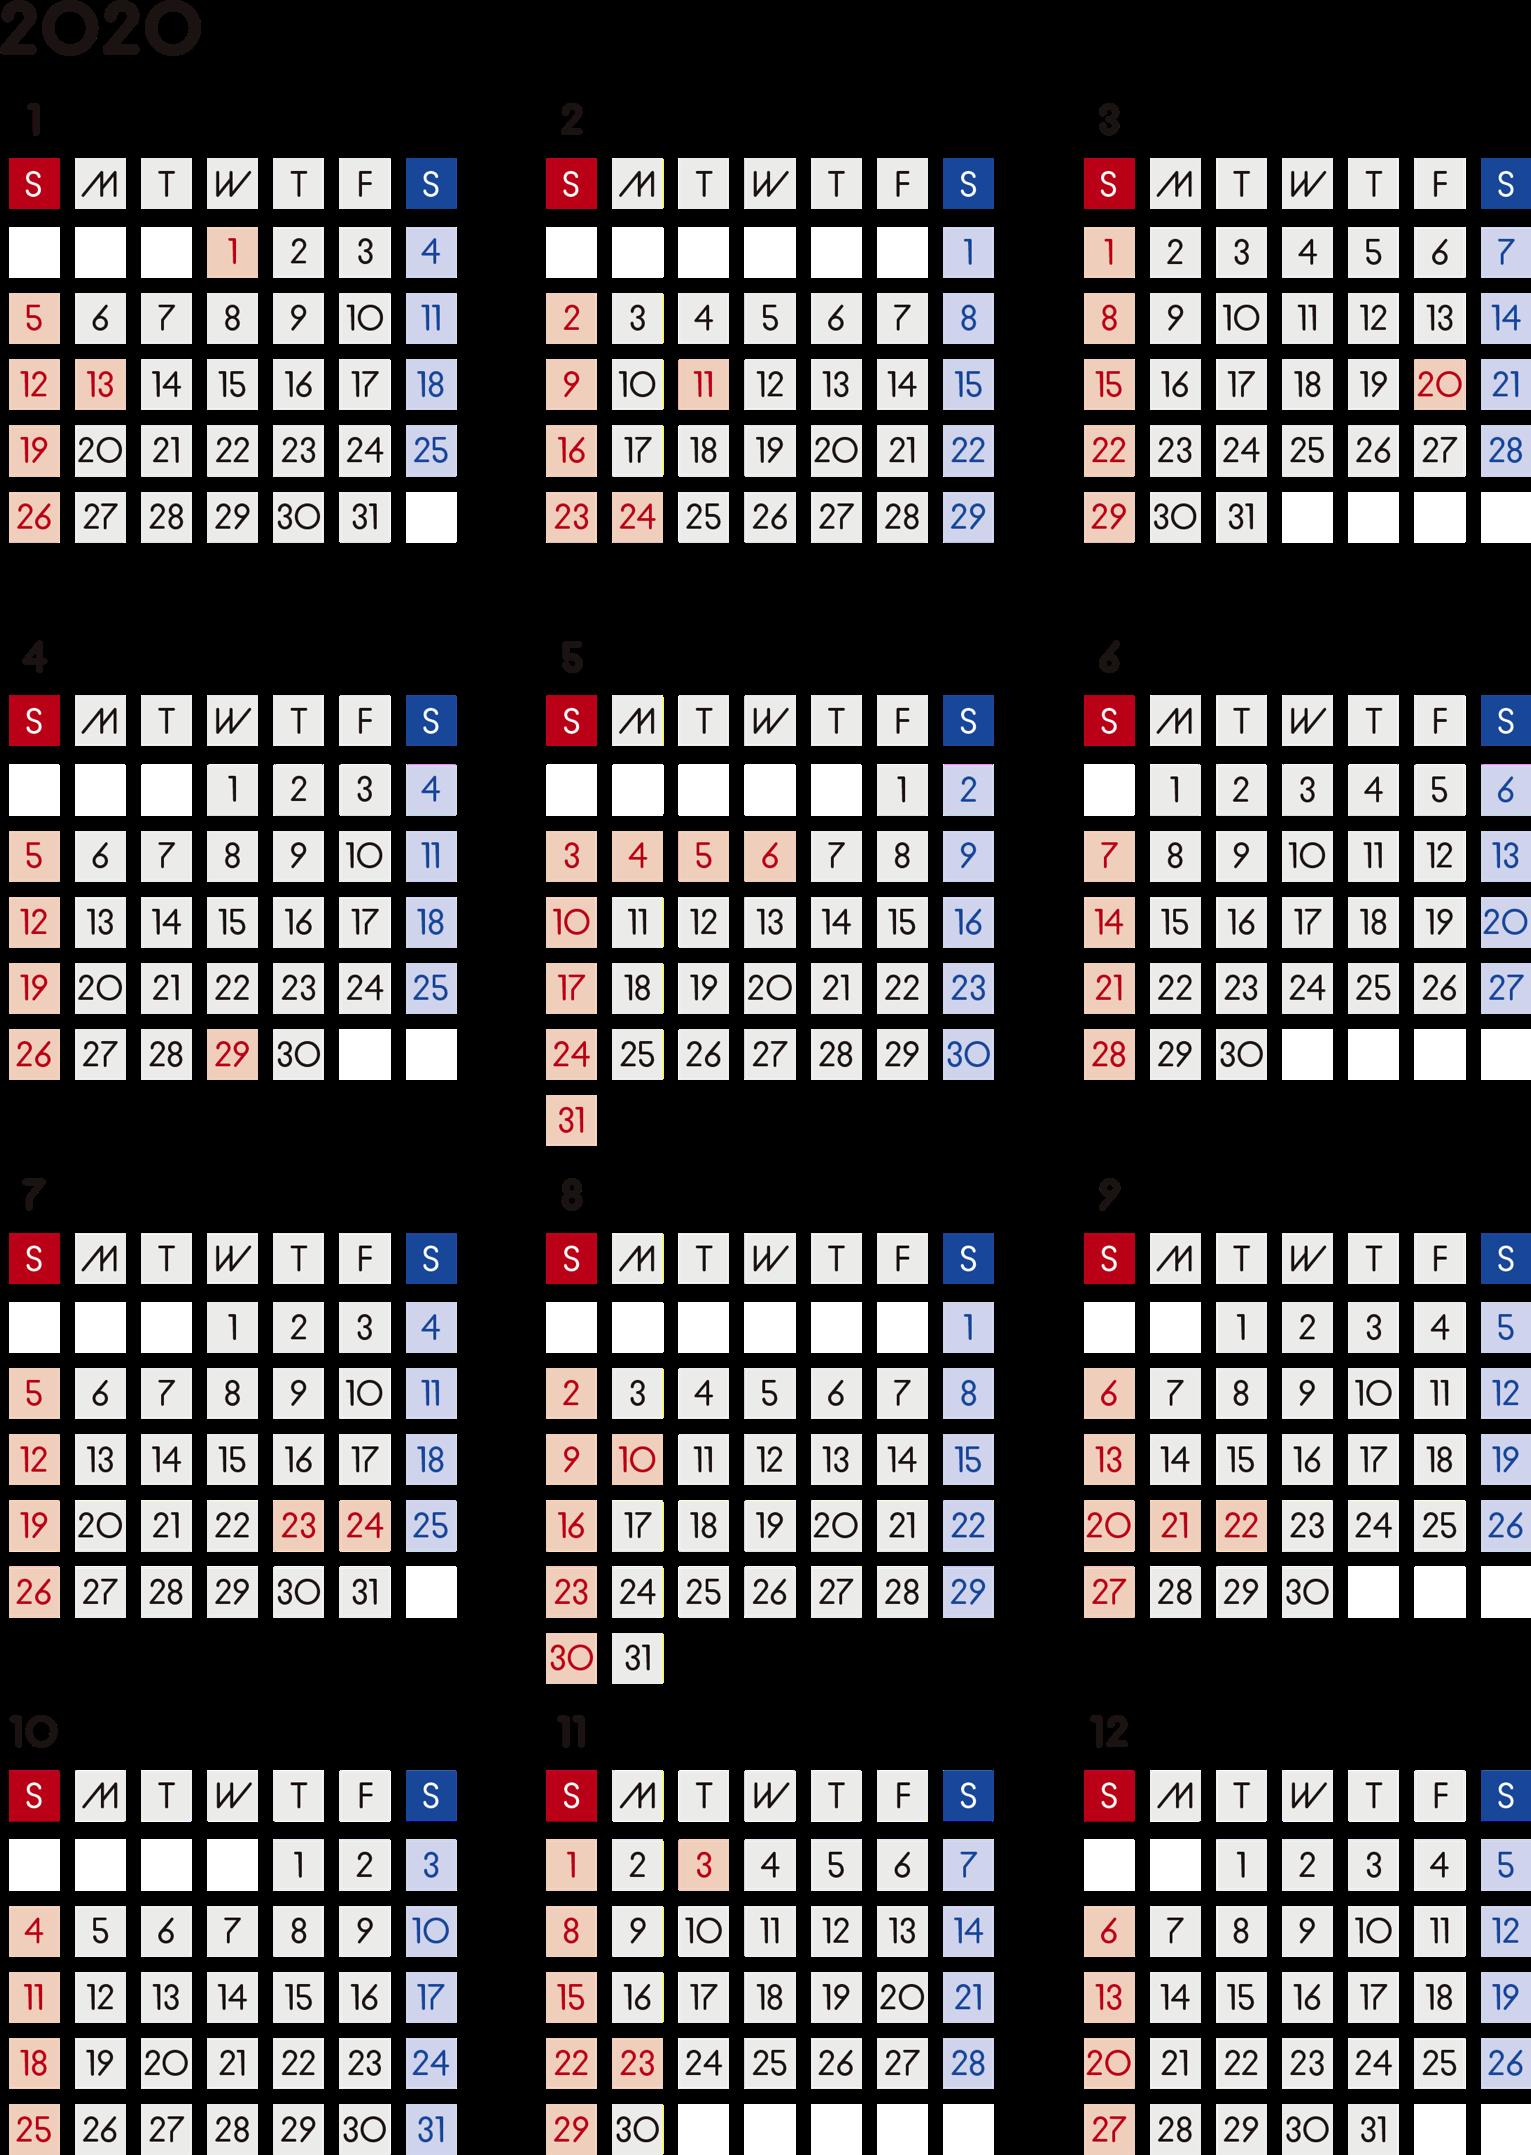 家族 カレンダー 2020 無料